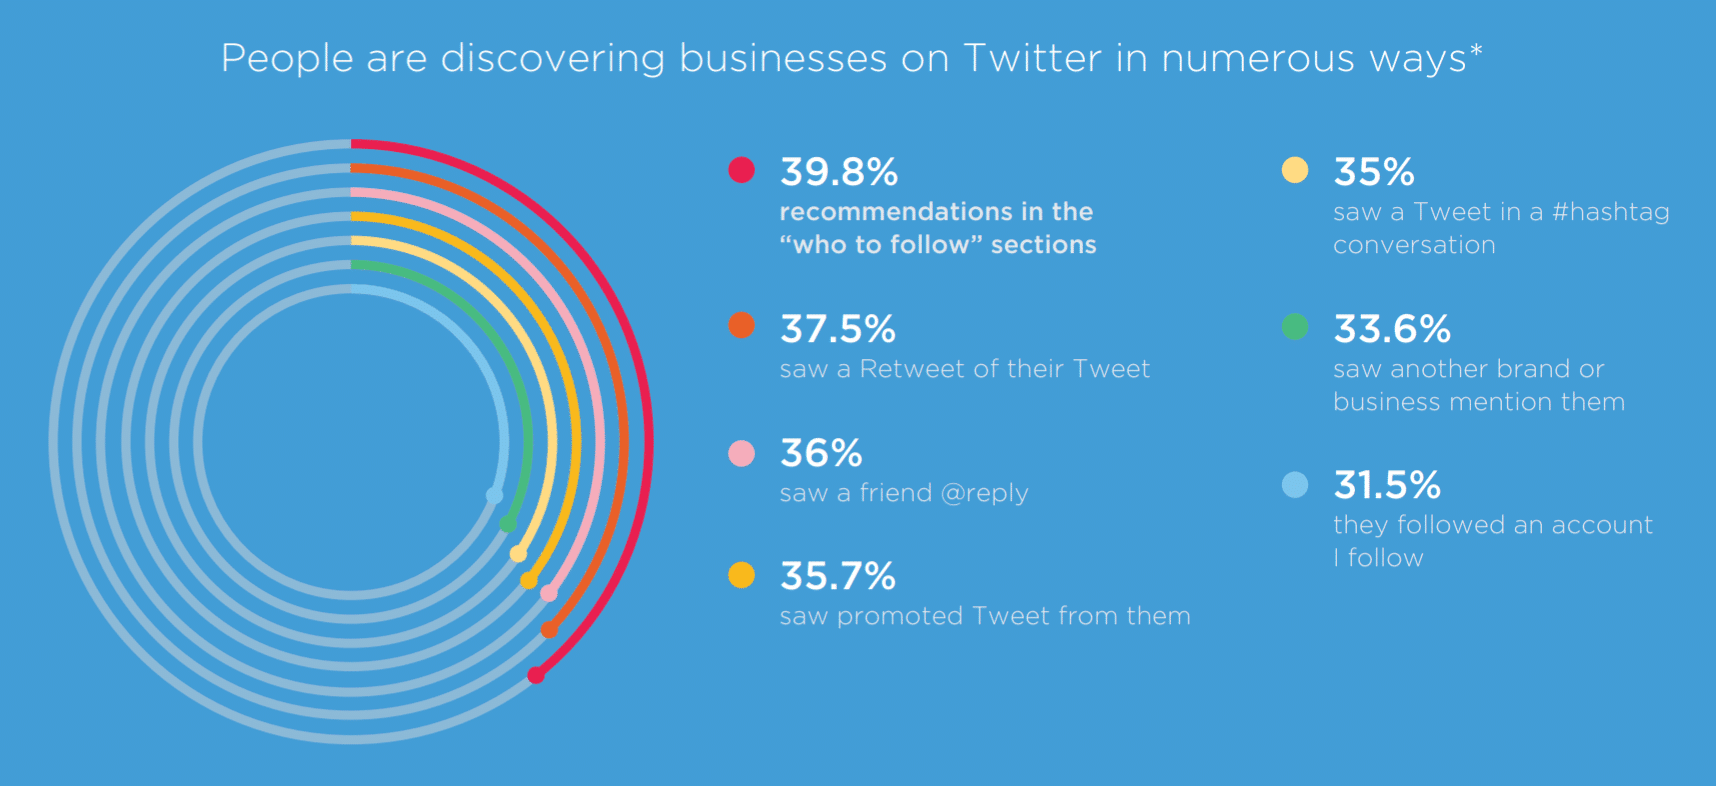 Descubriendo marcas en Twitter